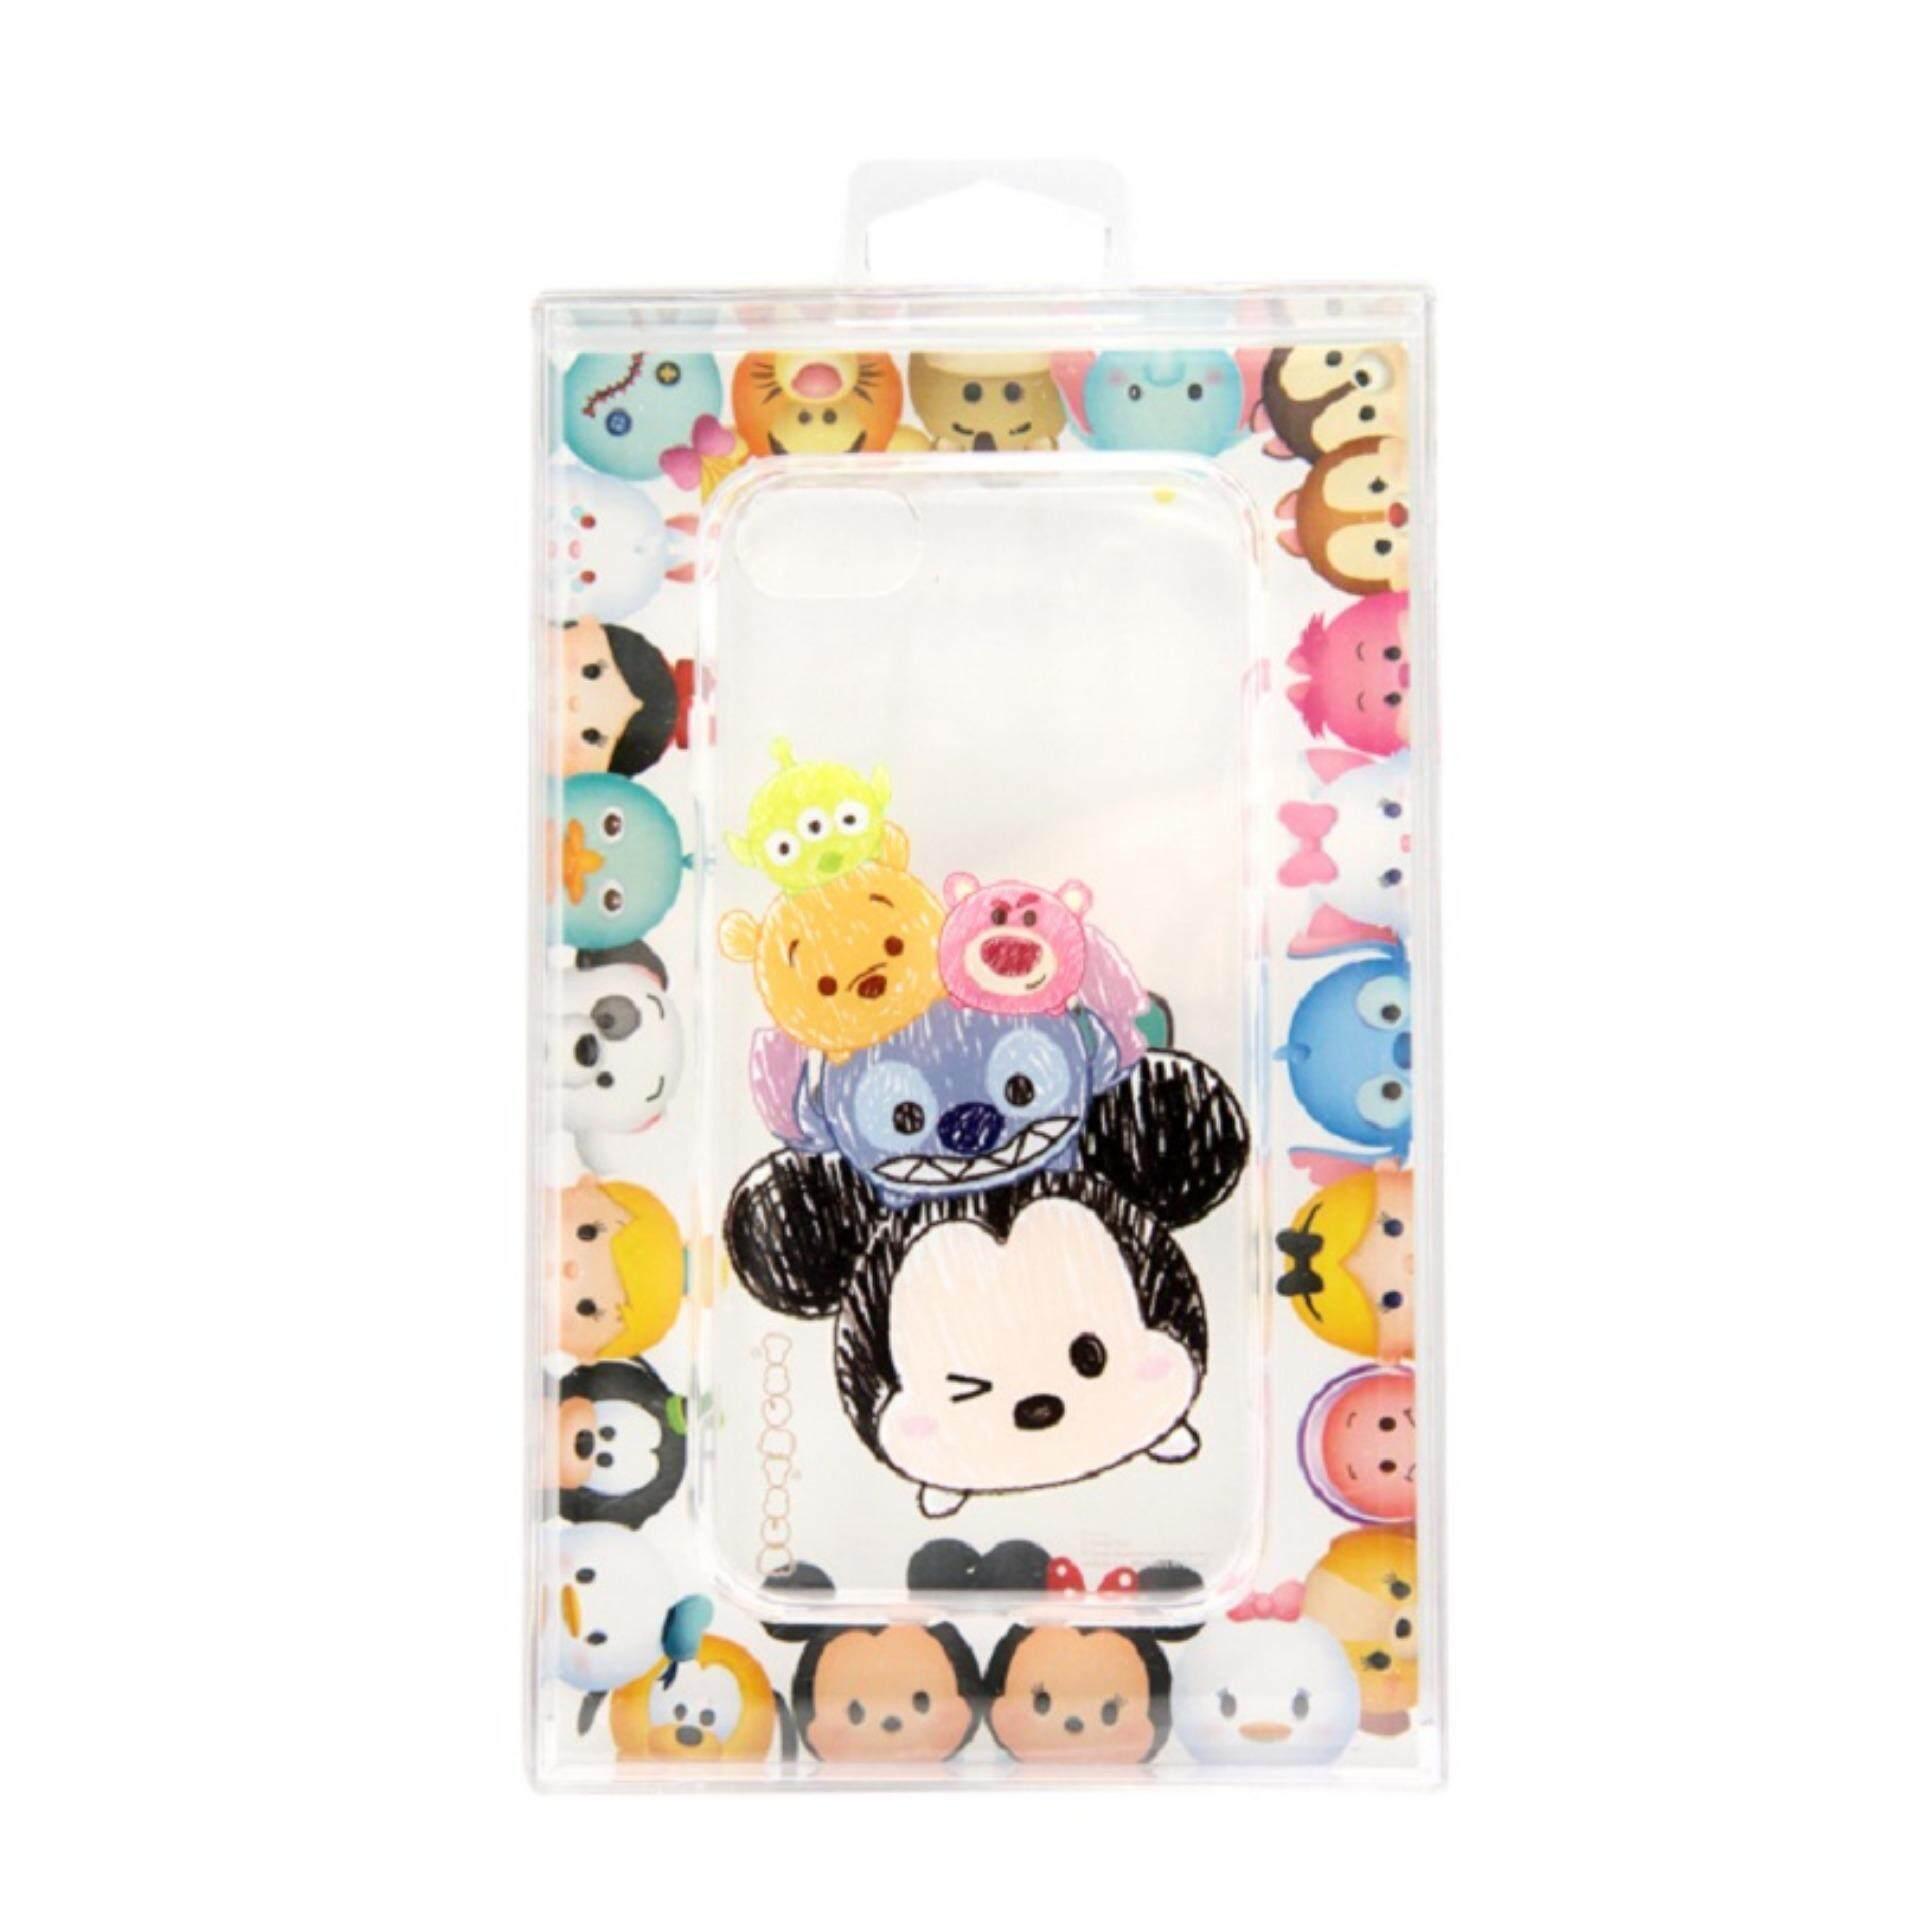 Disney Tsum Tsum Transparent iPhone 7 Case - Mickey & Friends